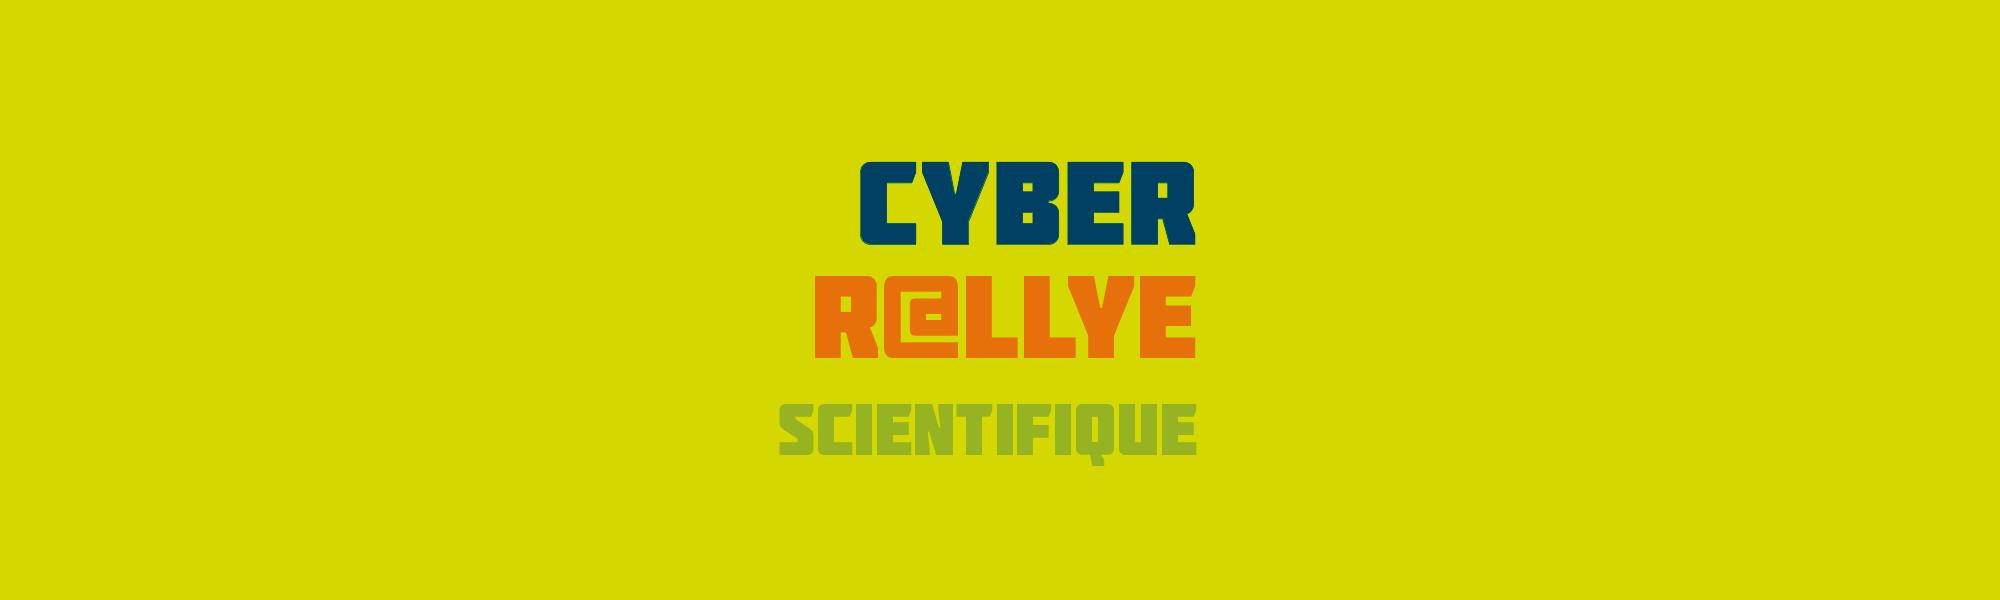 Banniere - Communication visuelle - Cyber Rallye 2018